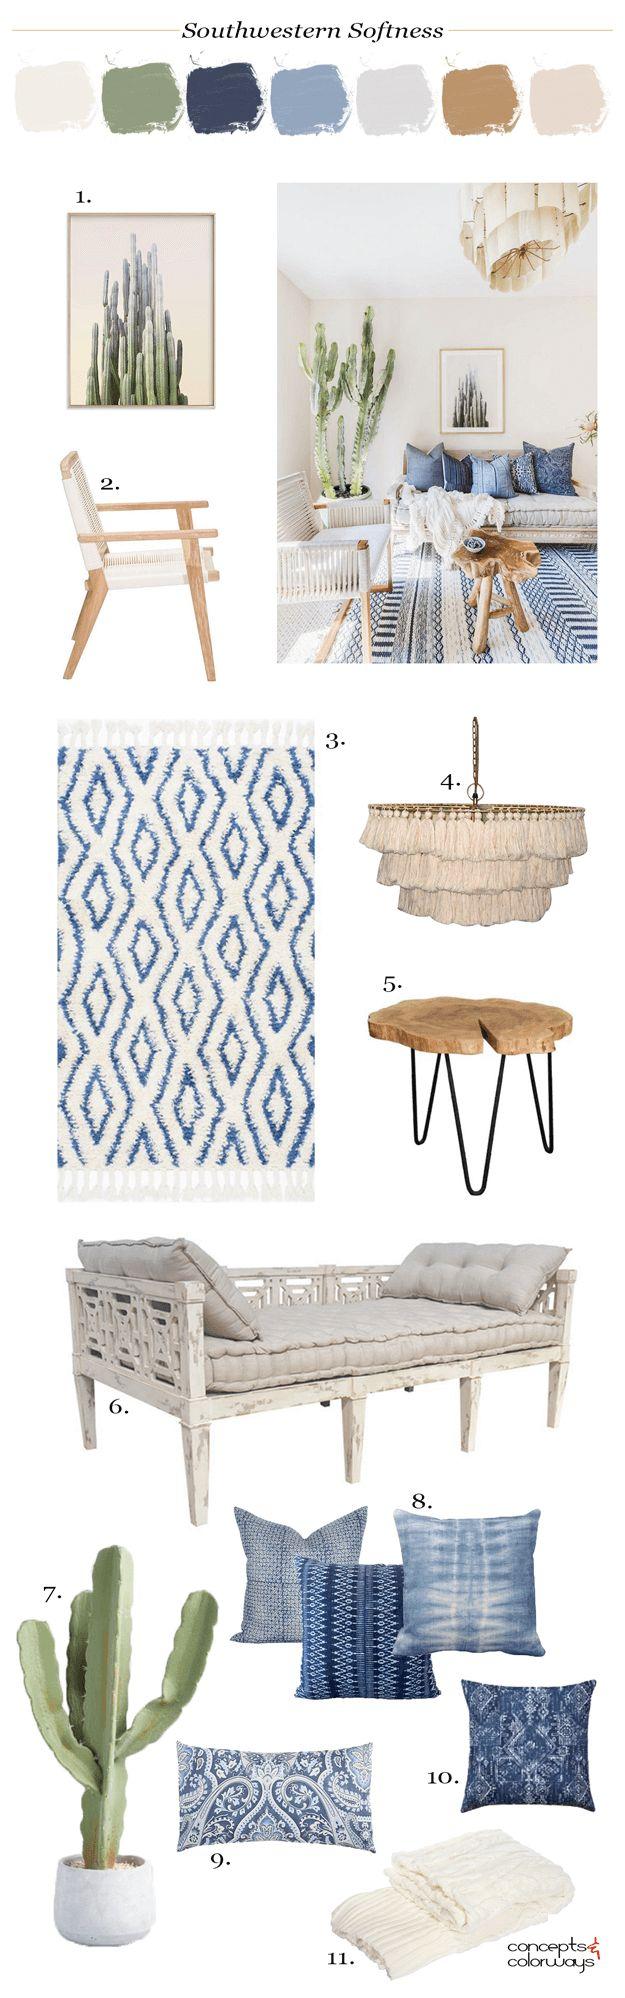 southwestern living room mood board, cactus plants, indigo pillows, indoor cactus, live edge coffee table, mudcloth, mudcloth pillow, southwestern decor, western decor